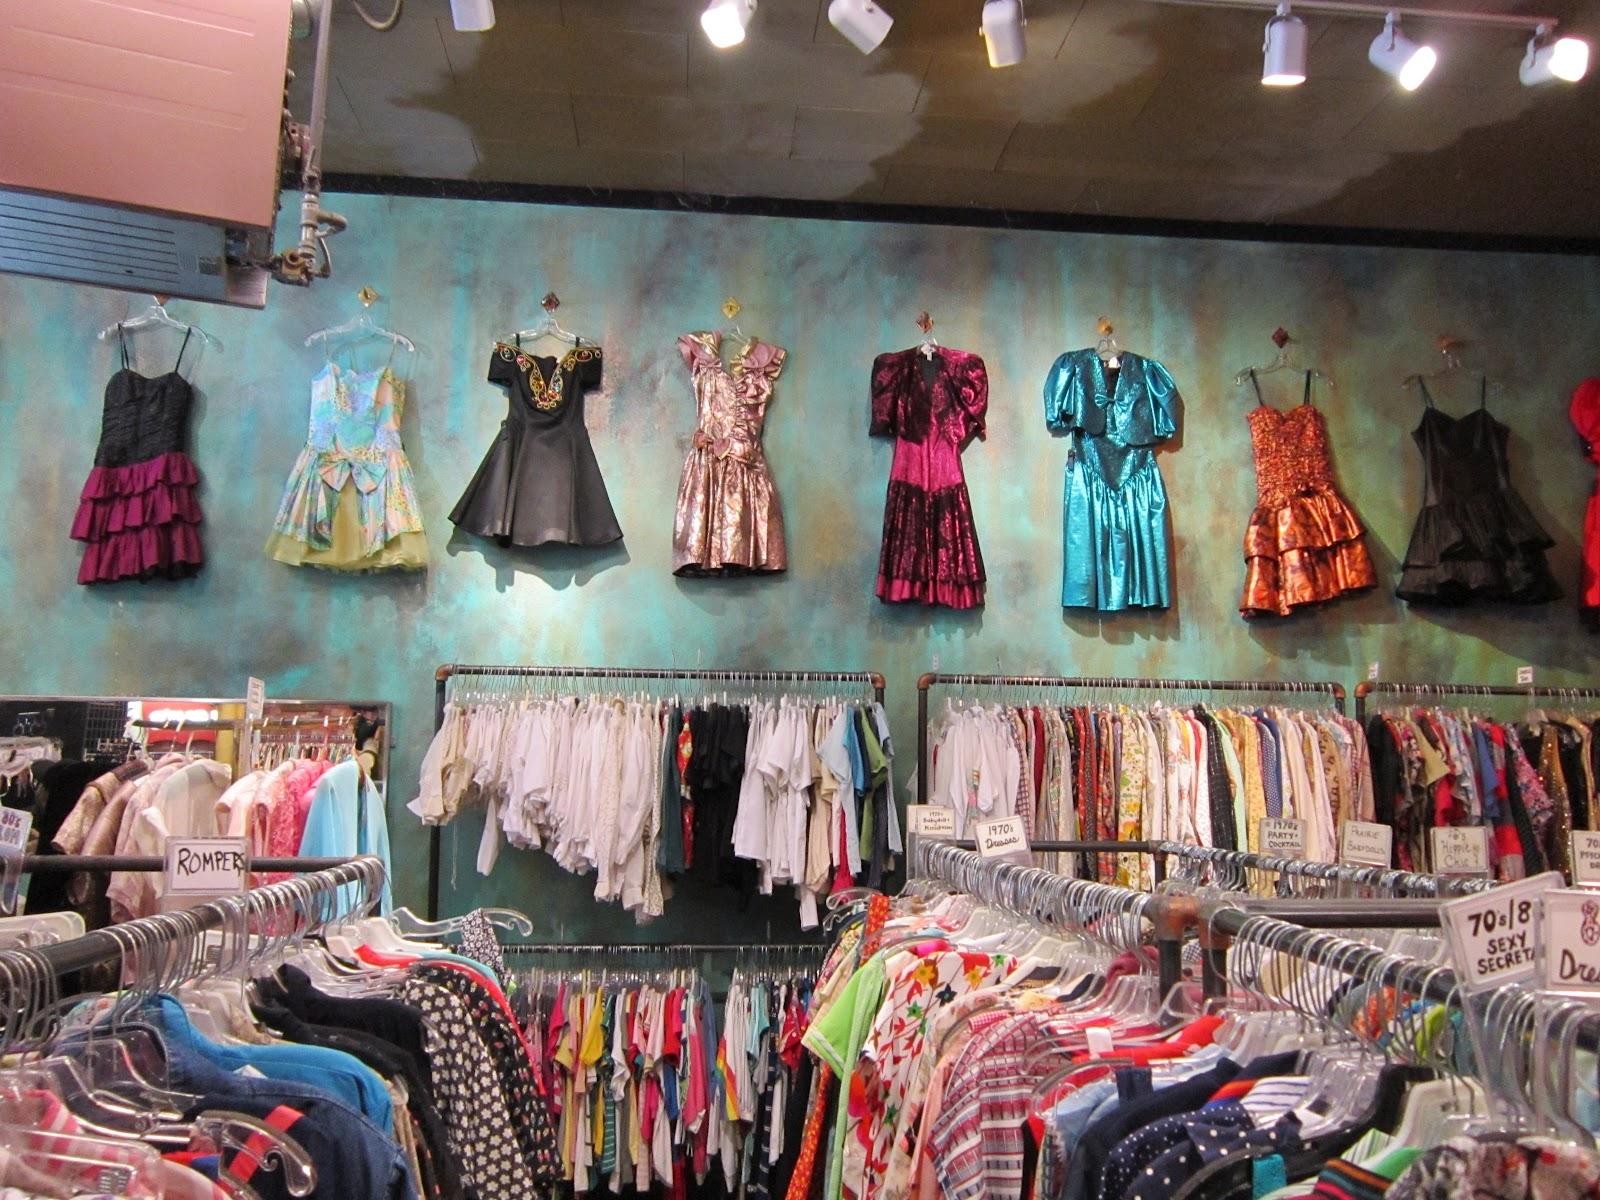 Toni S Vintage Trips Vintage On Haight Street In San